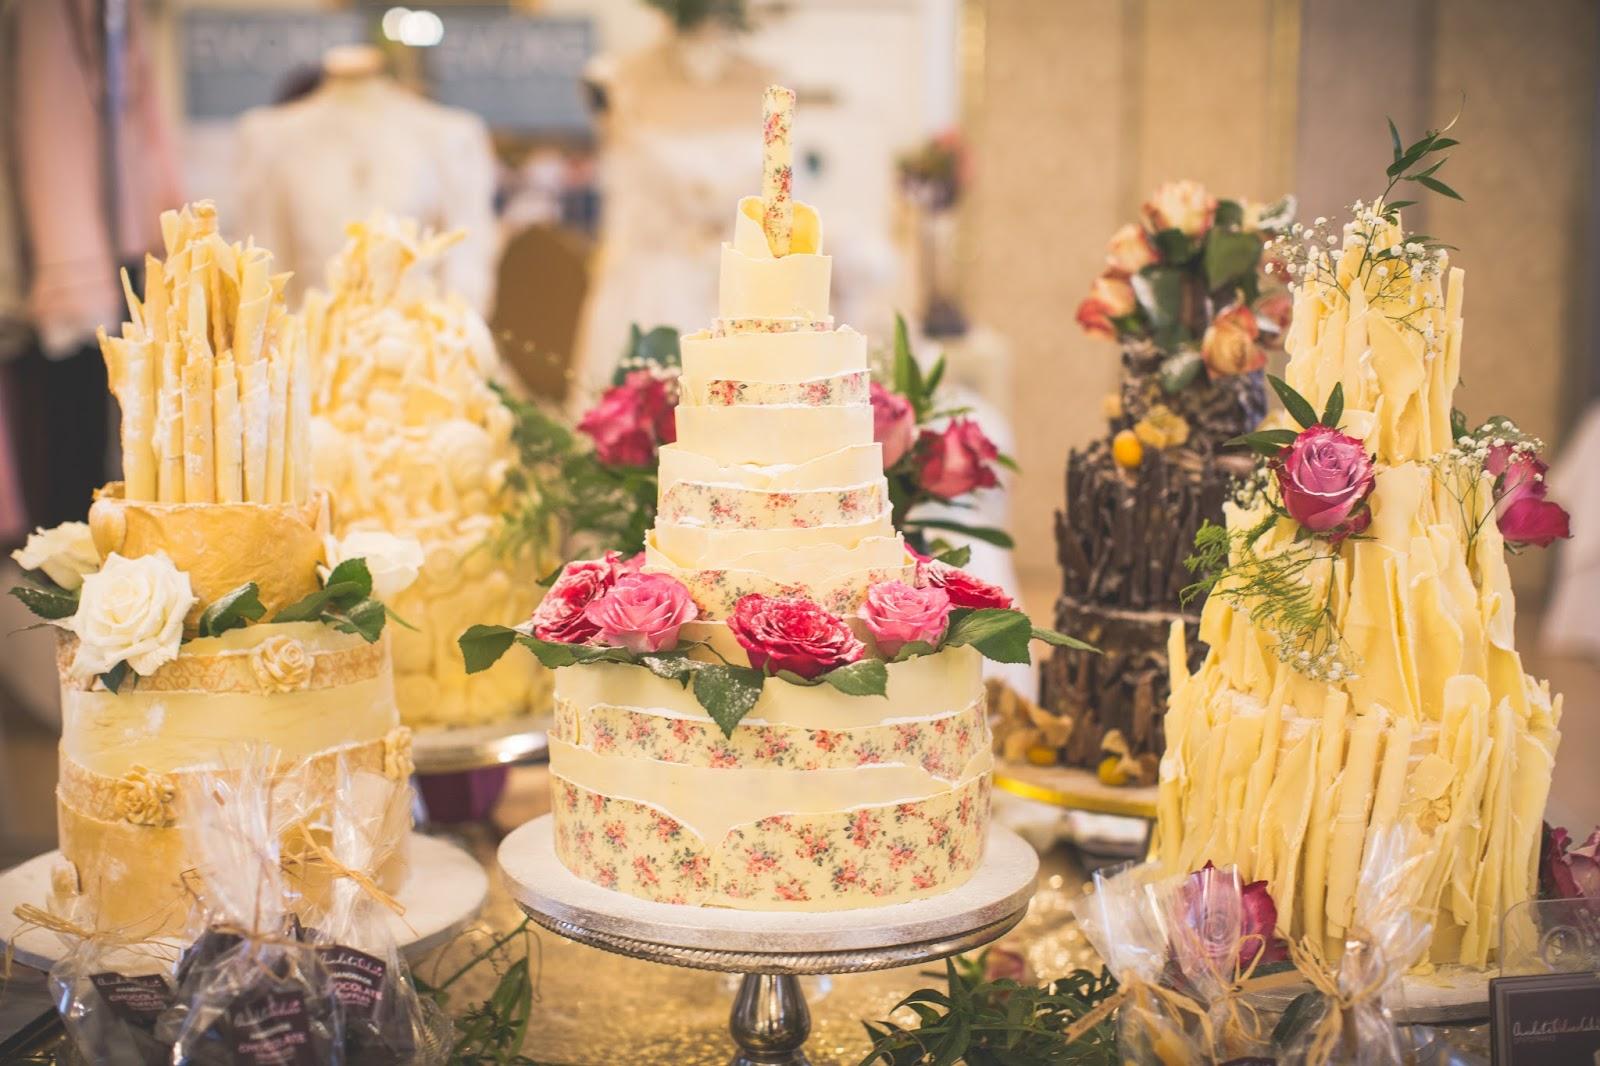 Bristol Vintage Wedding Fair: EVOKE PICTURES CAPTURE OUR BEAUTIFUL ...